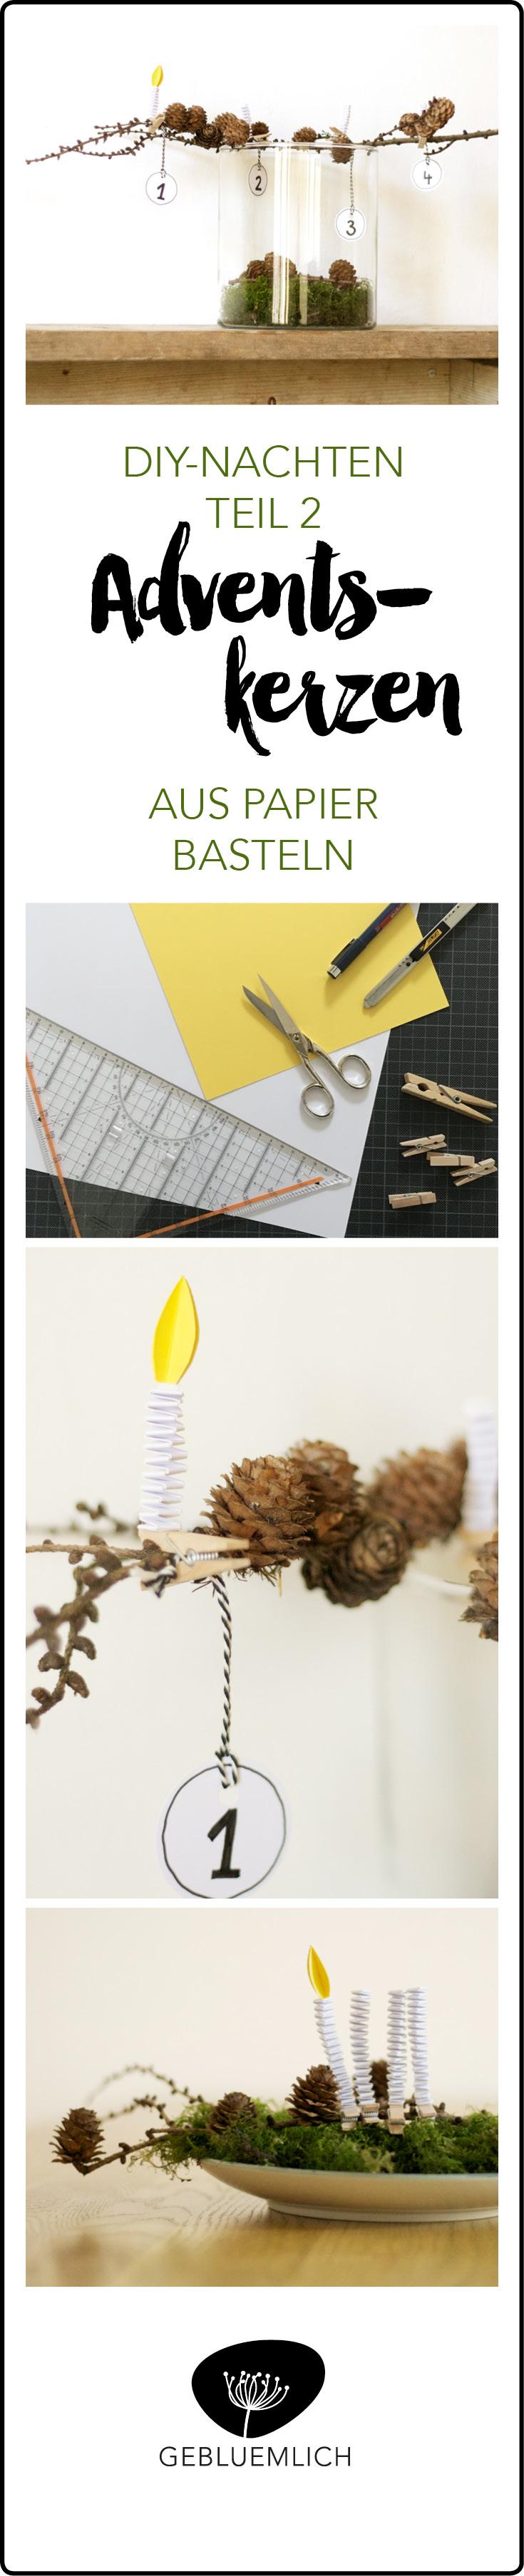 Adventskerzen aus Papier basteln